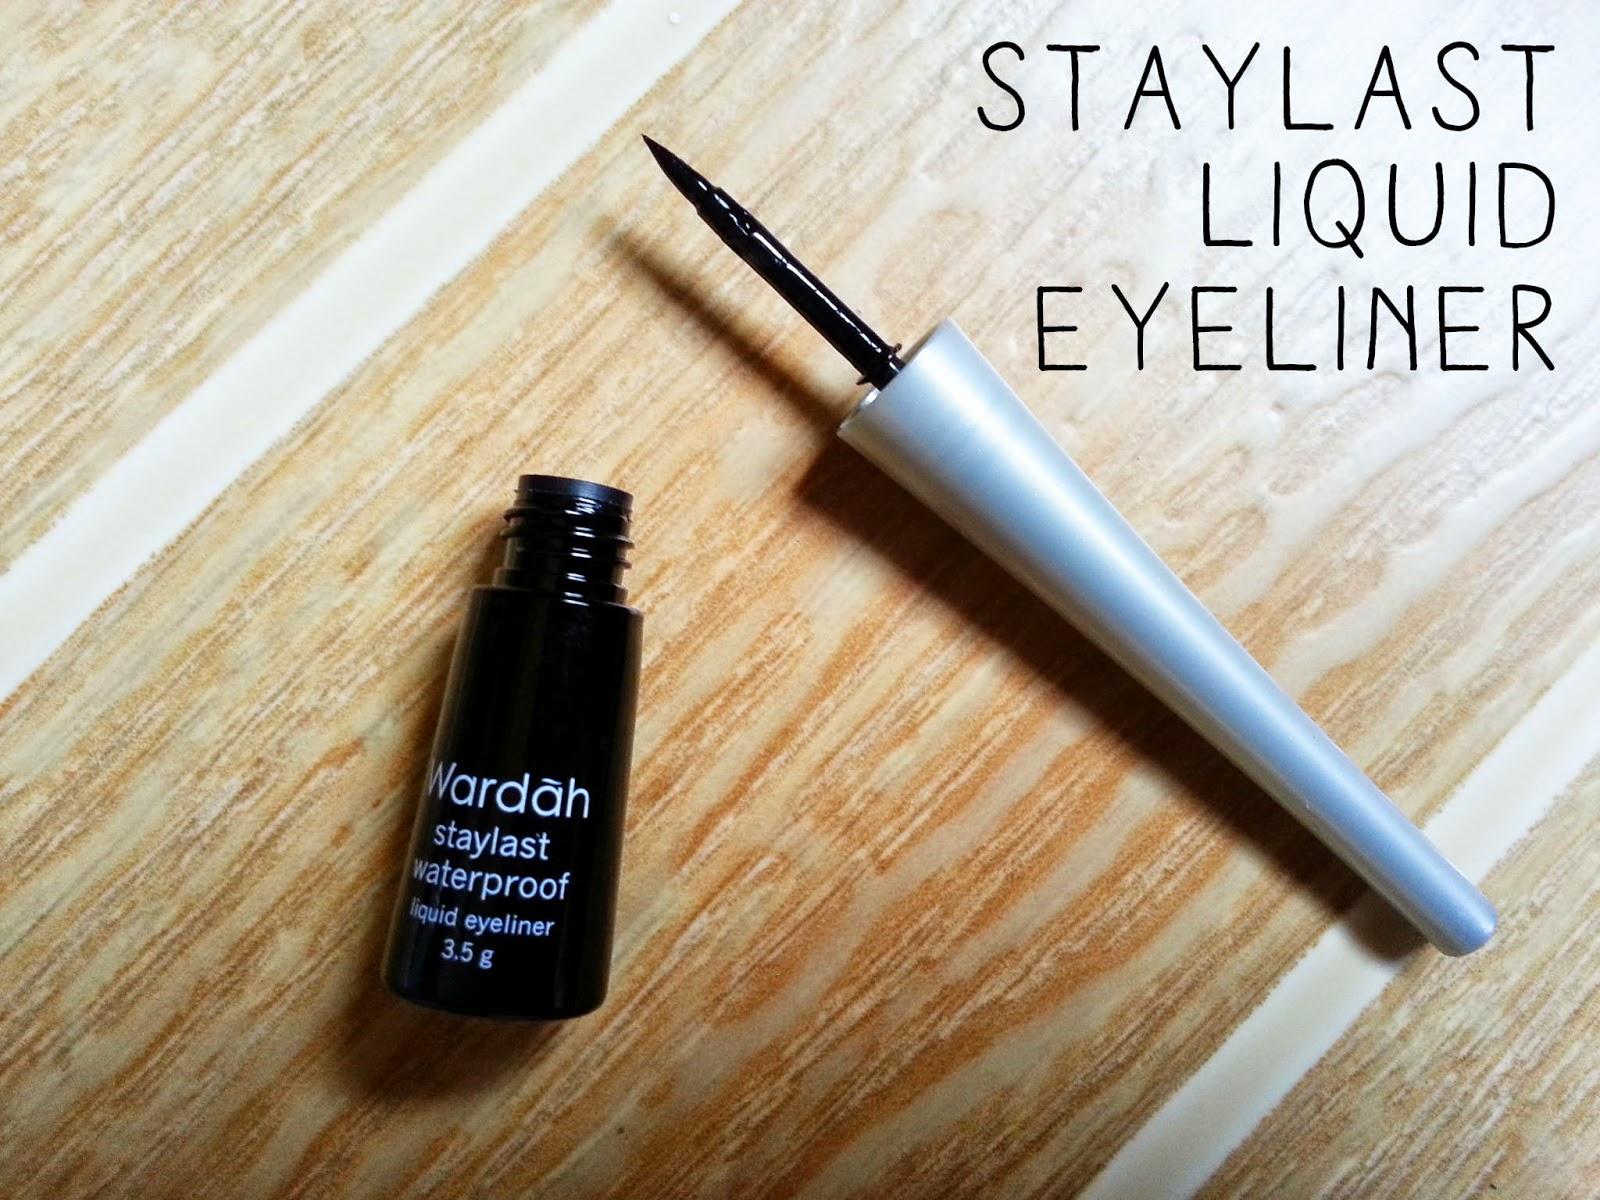 Produk Make up Wardah yang Tahan Lama dan Anti Air